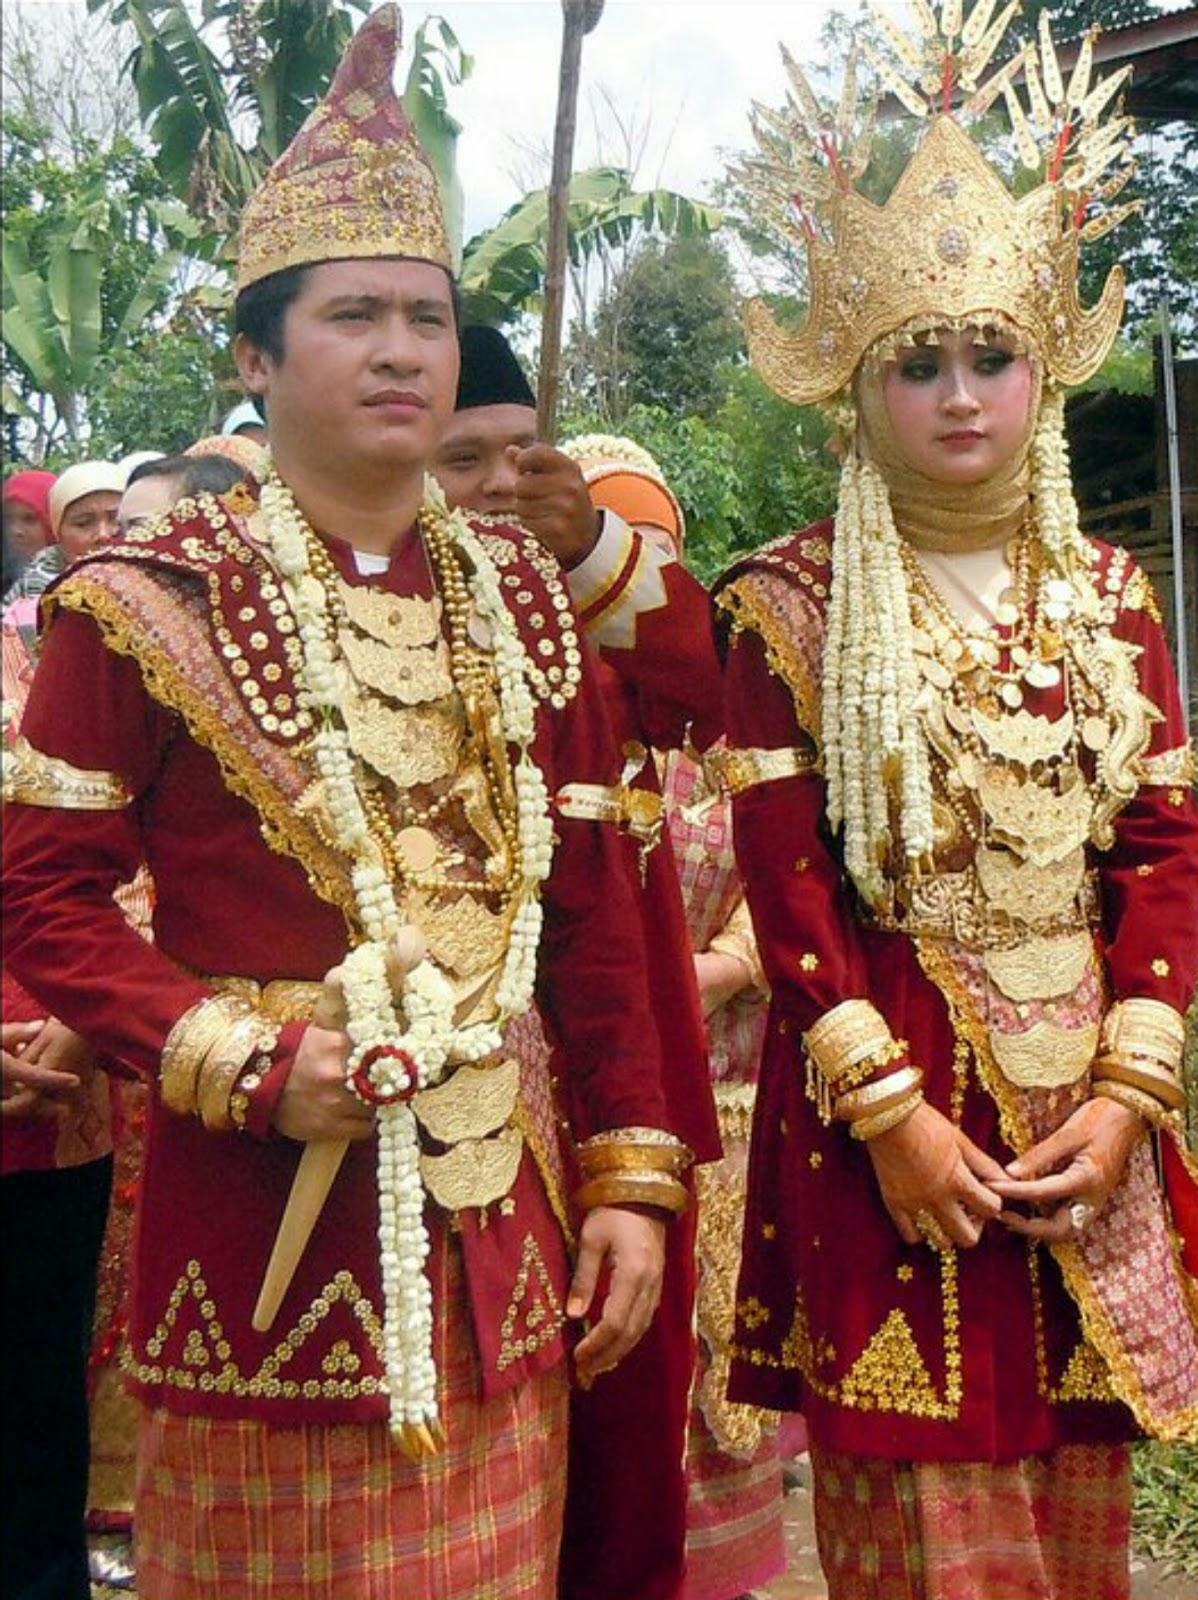 Pakaian Pengantin Pria Adat Lampung Saibatin Dan Pepadun Beserta